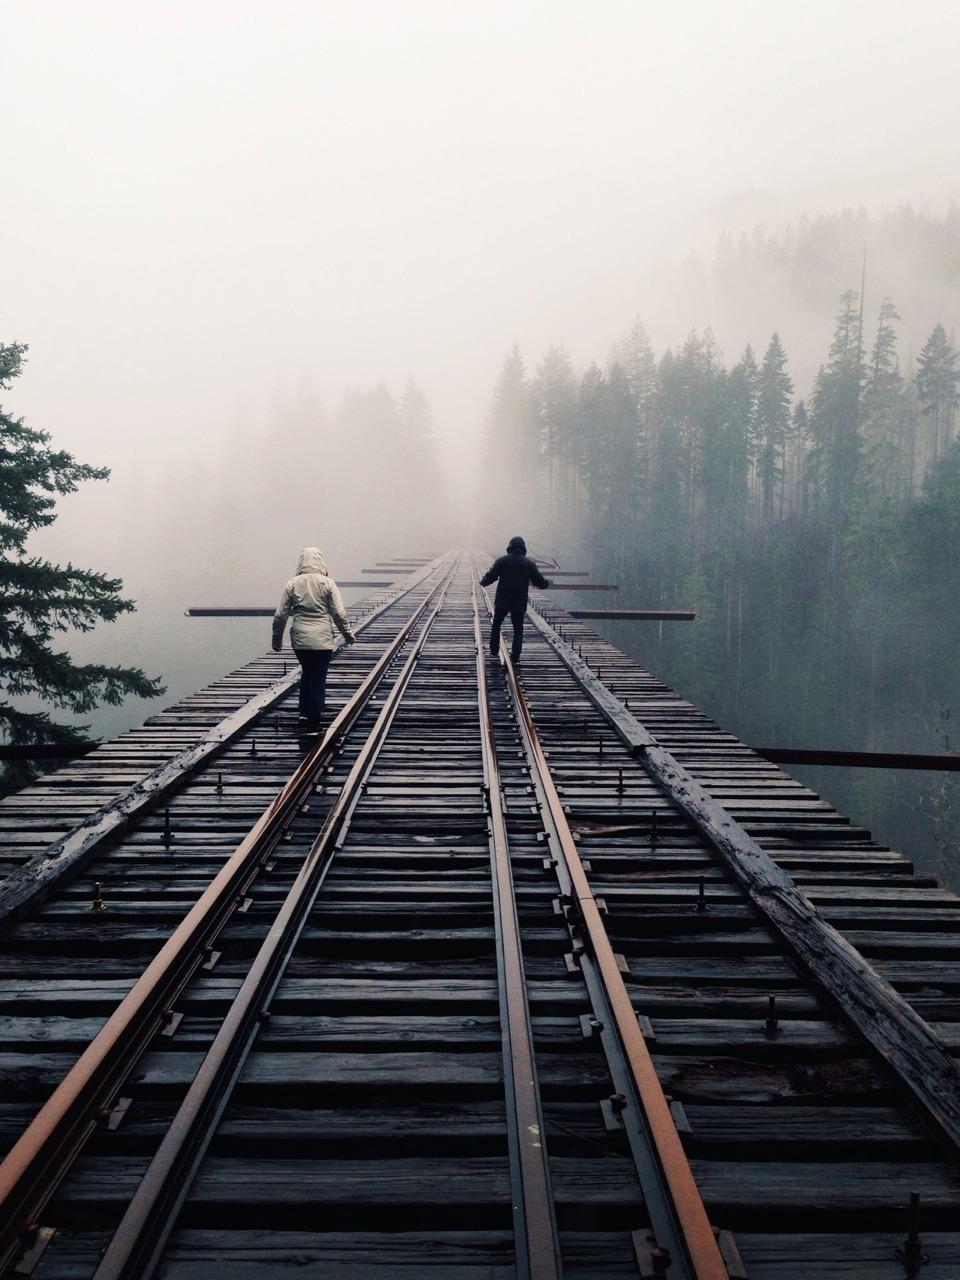 greyandblak:  Finally made it to the legendary Vance Creek Bridge